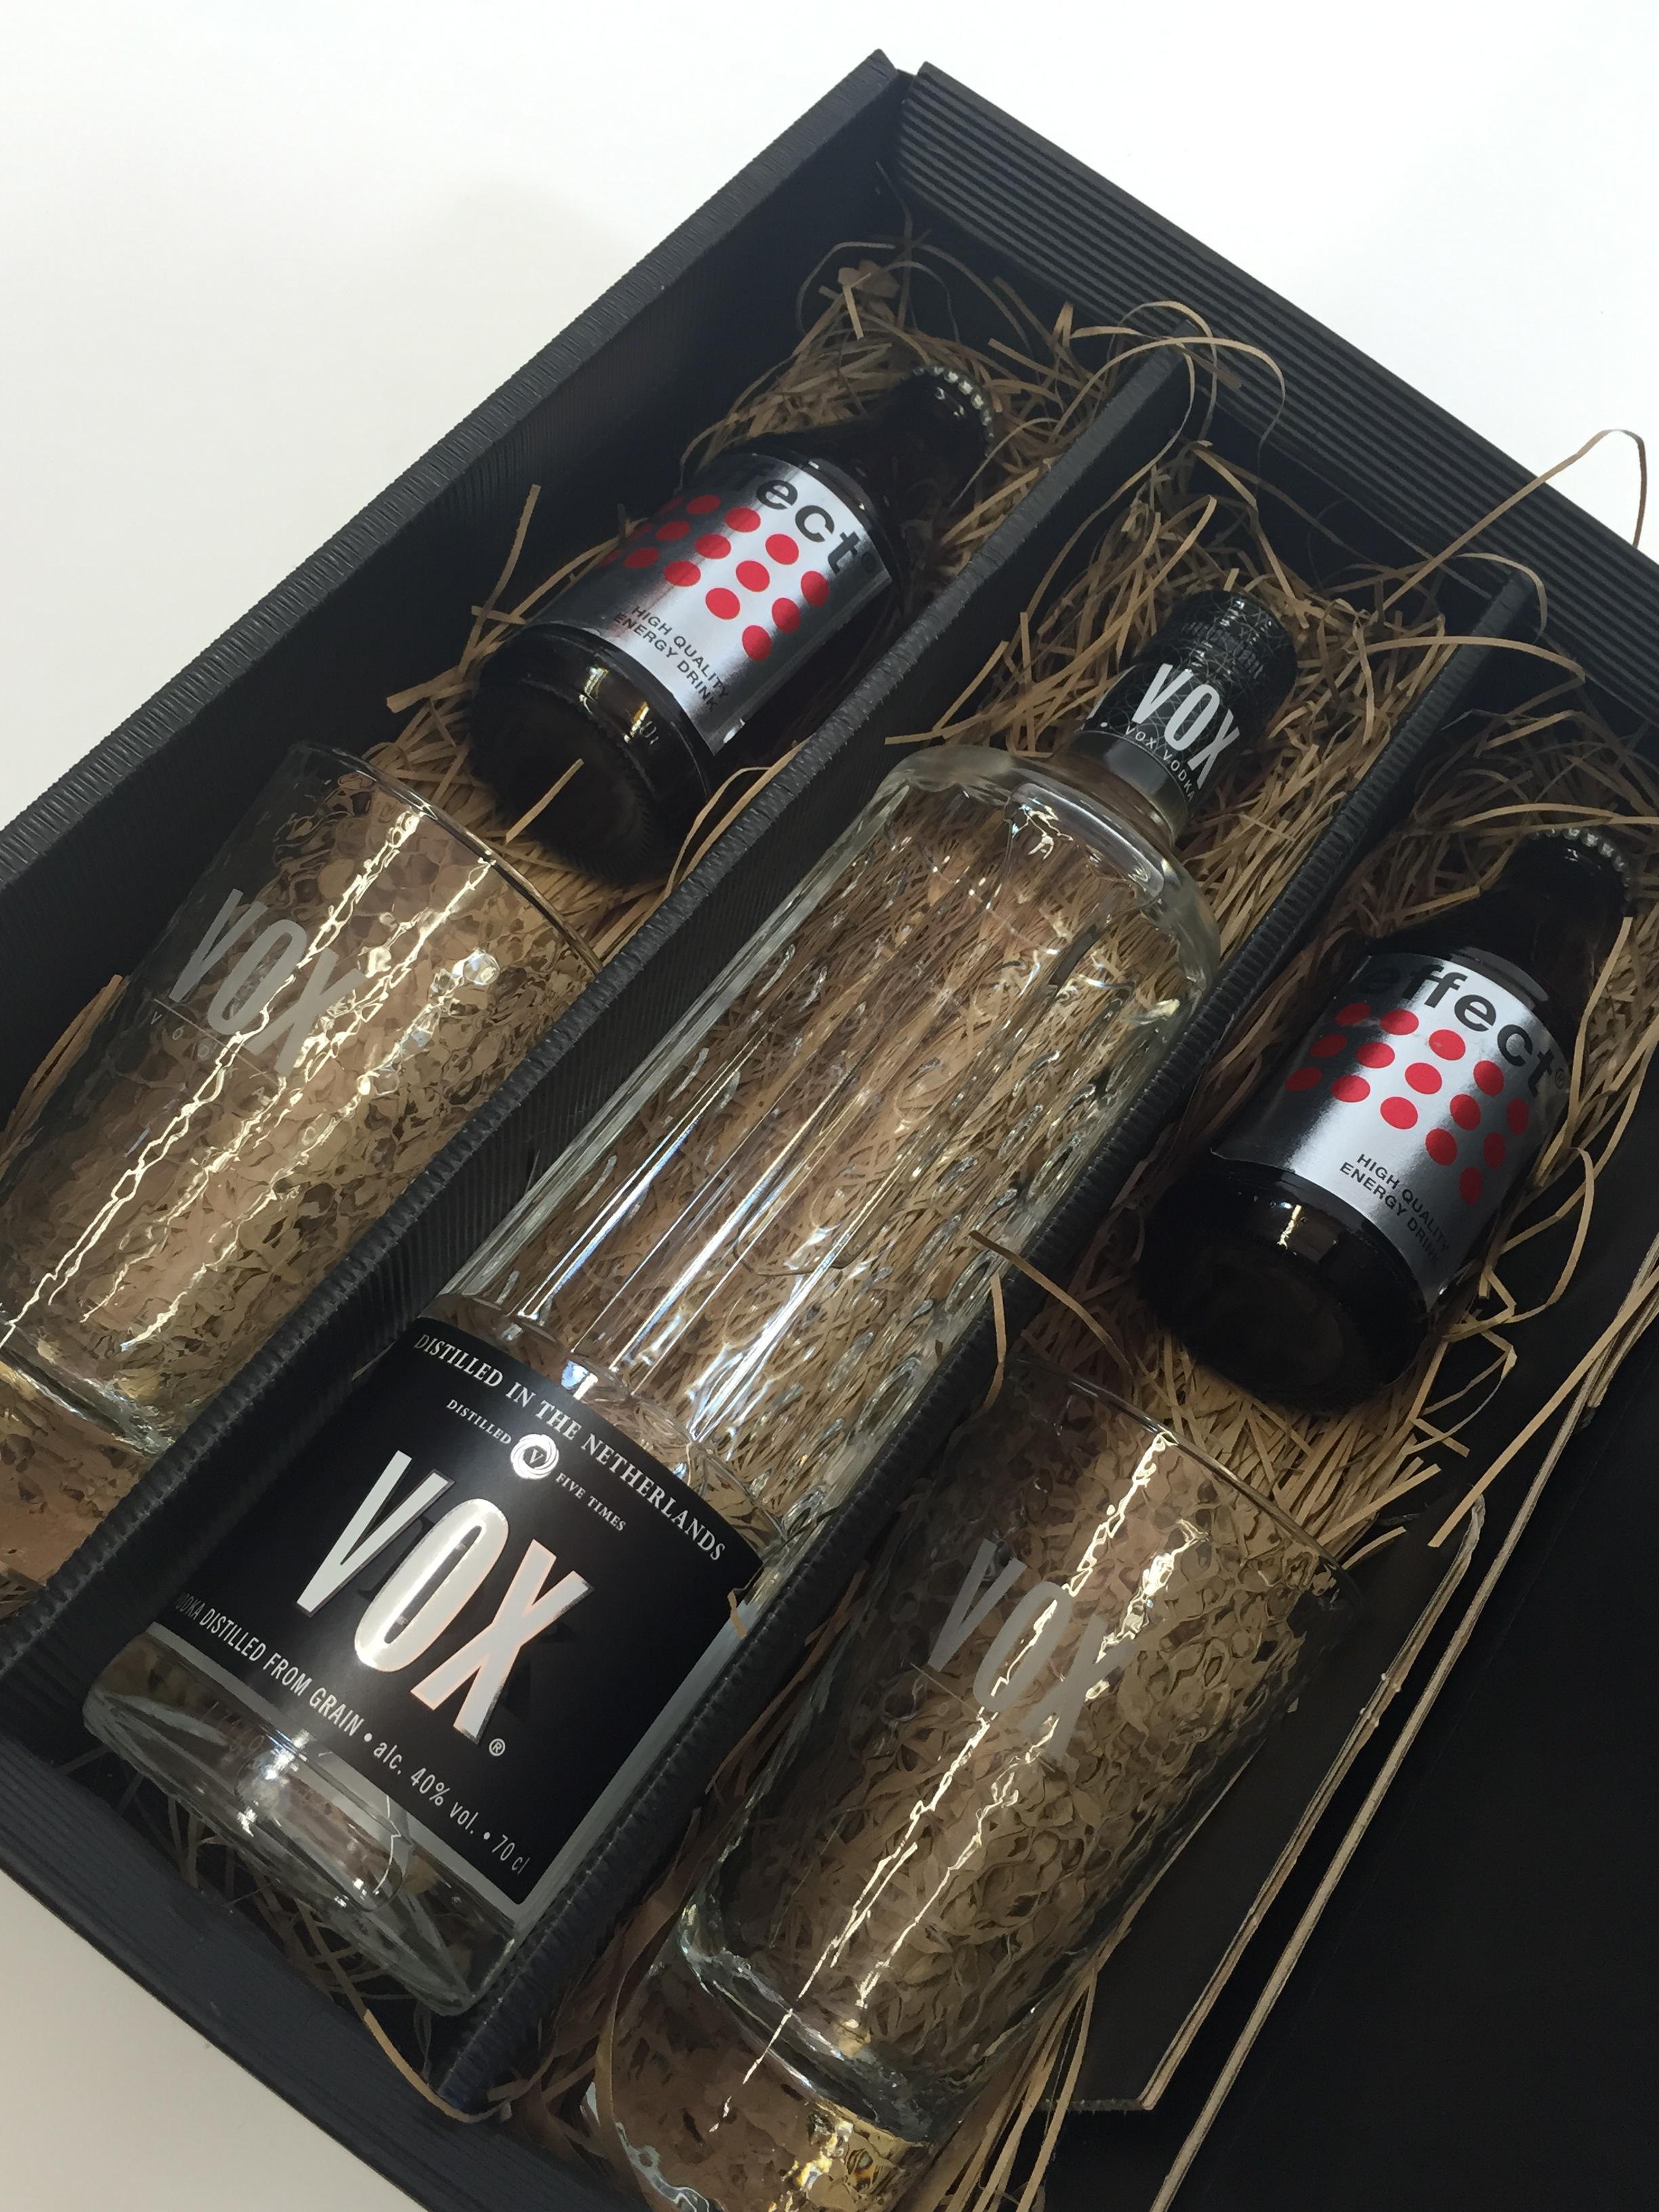 VOX Vodka Lemon Set / Geschenkset - VOX Vodka 0,7l 700ml (40% Vol) + 2x Longdrinkgläser + 2x Effect Energy Drink 200ml